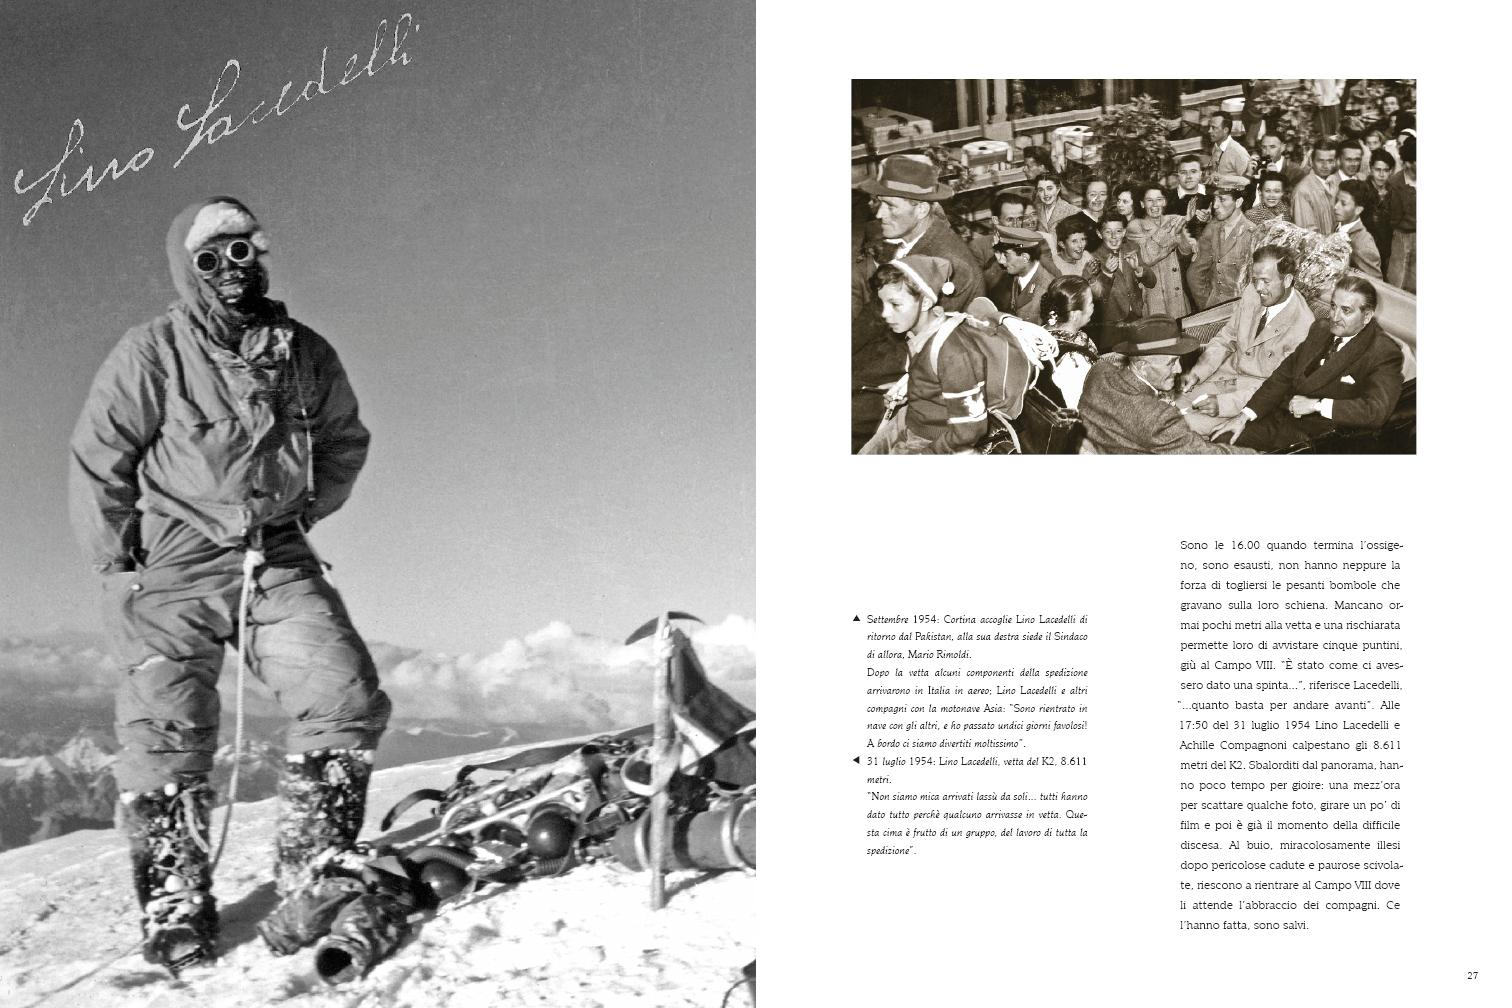 K2 EXPEDITION 1954-2004 Giuseppe Ghedina Fotografo - 015.jpg